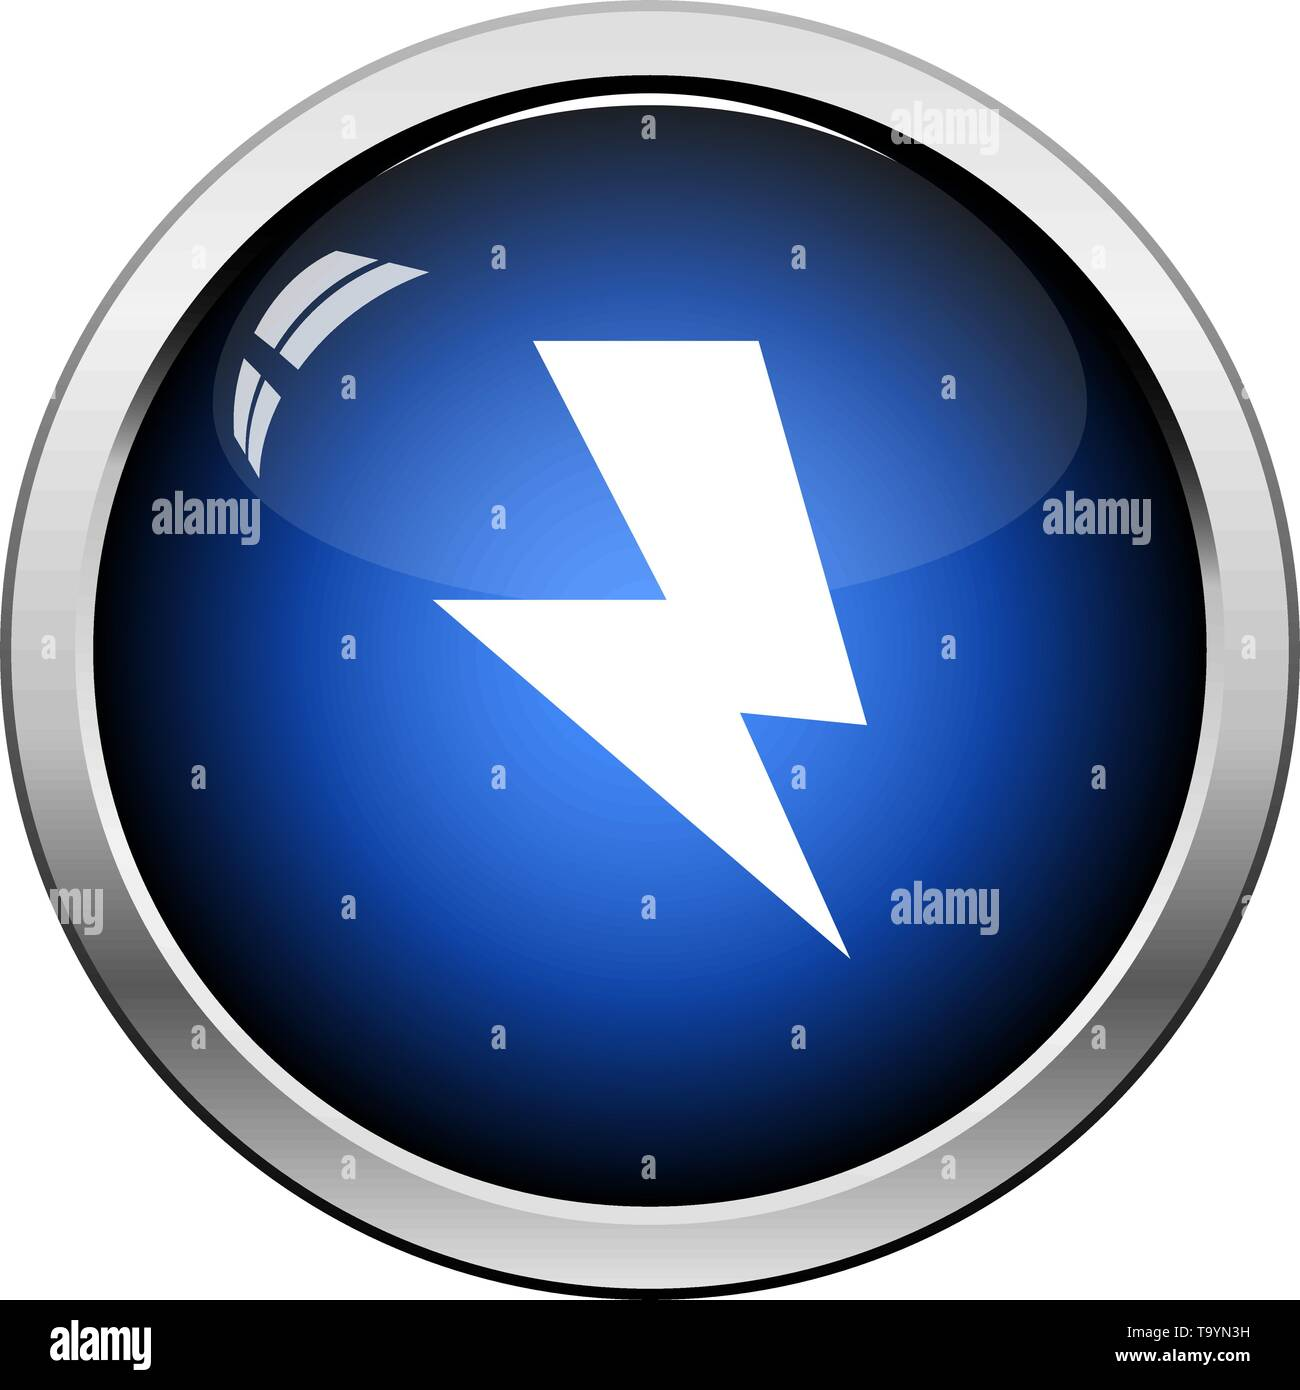 Reversed Bolt Icon. Glossy Button Design. Vector Illustration. - Stock Image